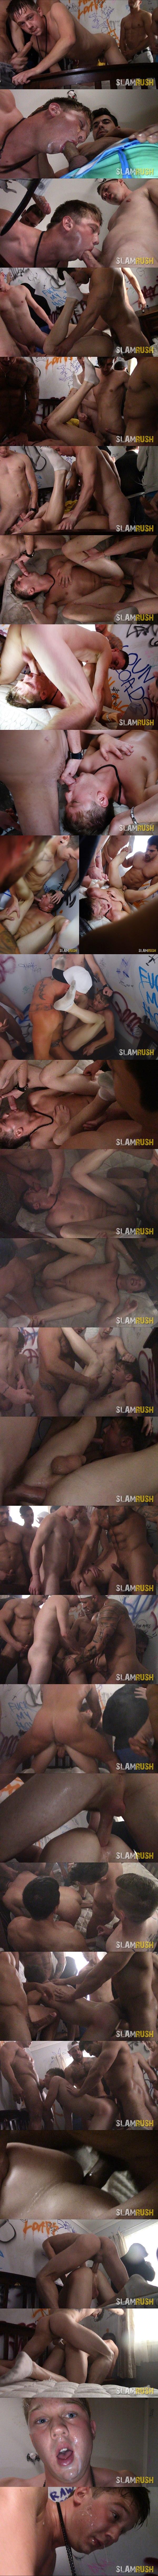 Aiden Ward, Alex Chandler, Broc, Damien Stone, Grayson Lange, Jeremy Spreadums, Kyle, Kyler, Michael Roman and Sebastian gangbang breed Josh in Shot Gunned at Slamrush 01